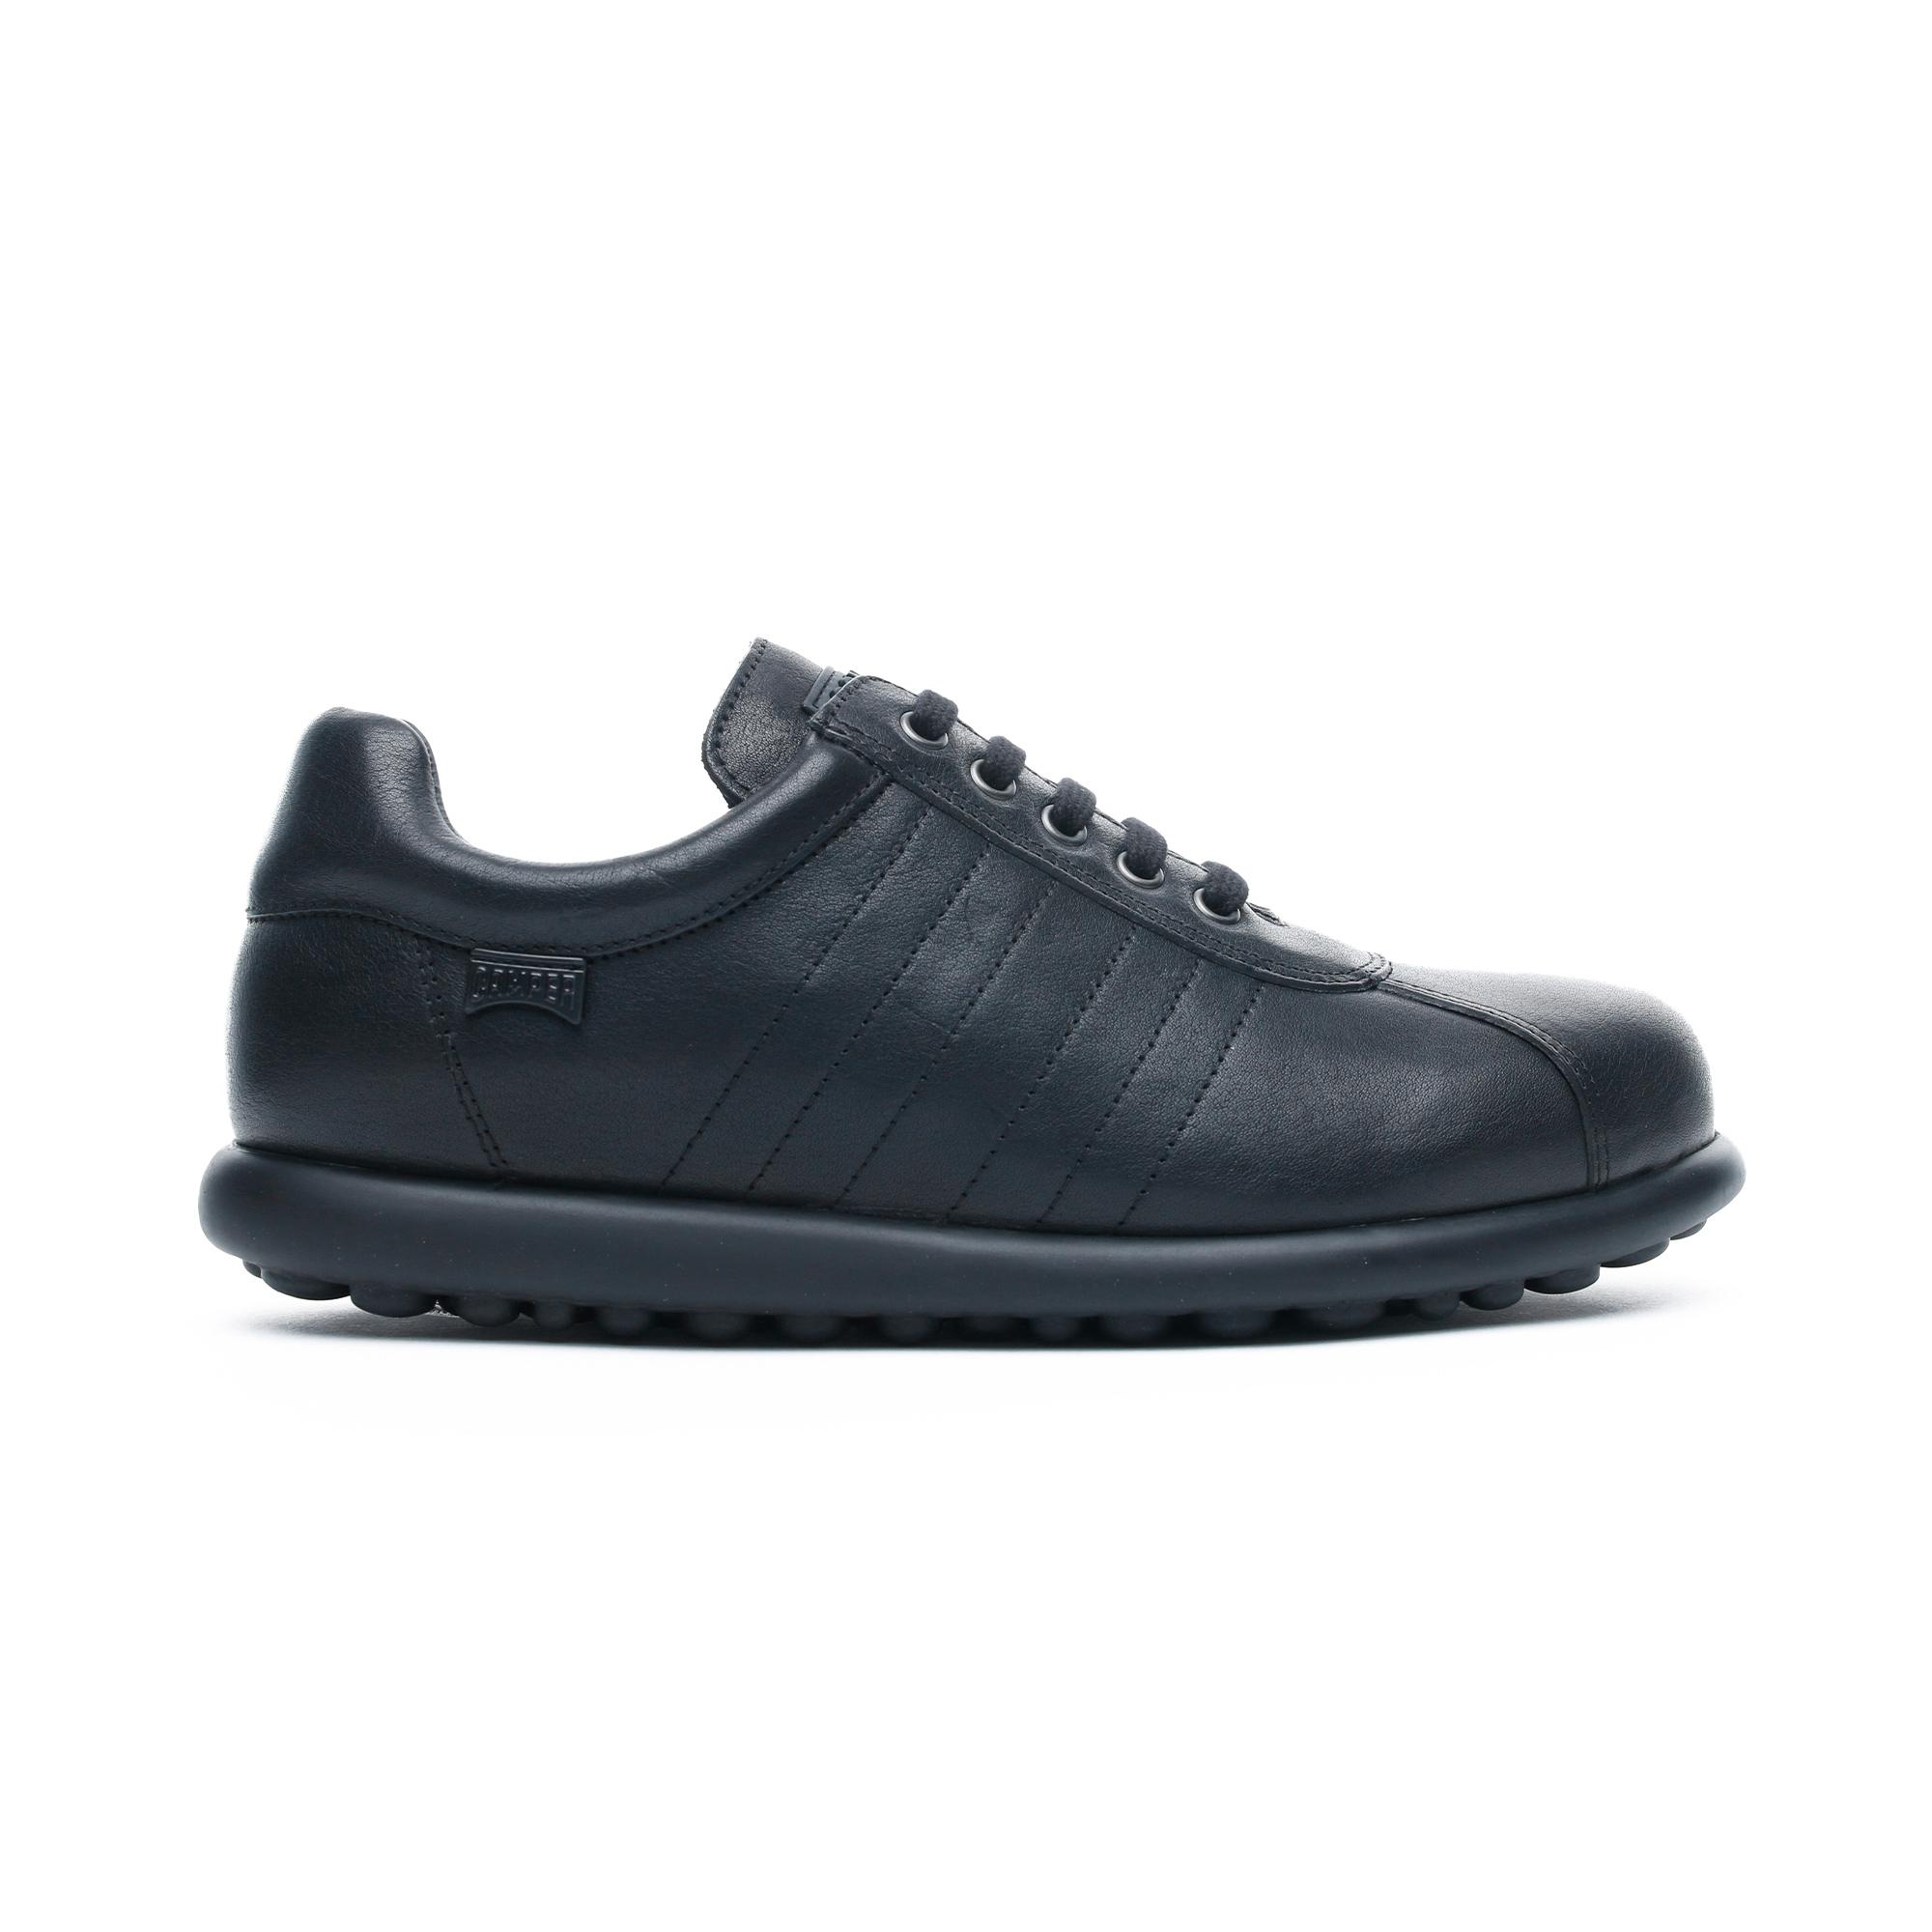 Pelotas Ariel Erkek Siyah Ayakkabı